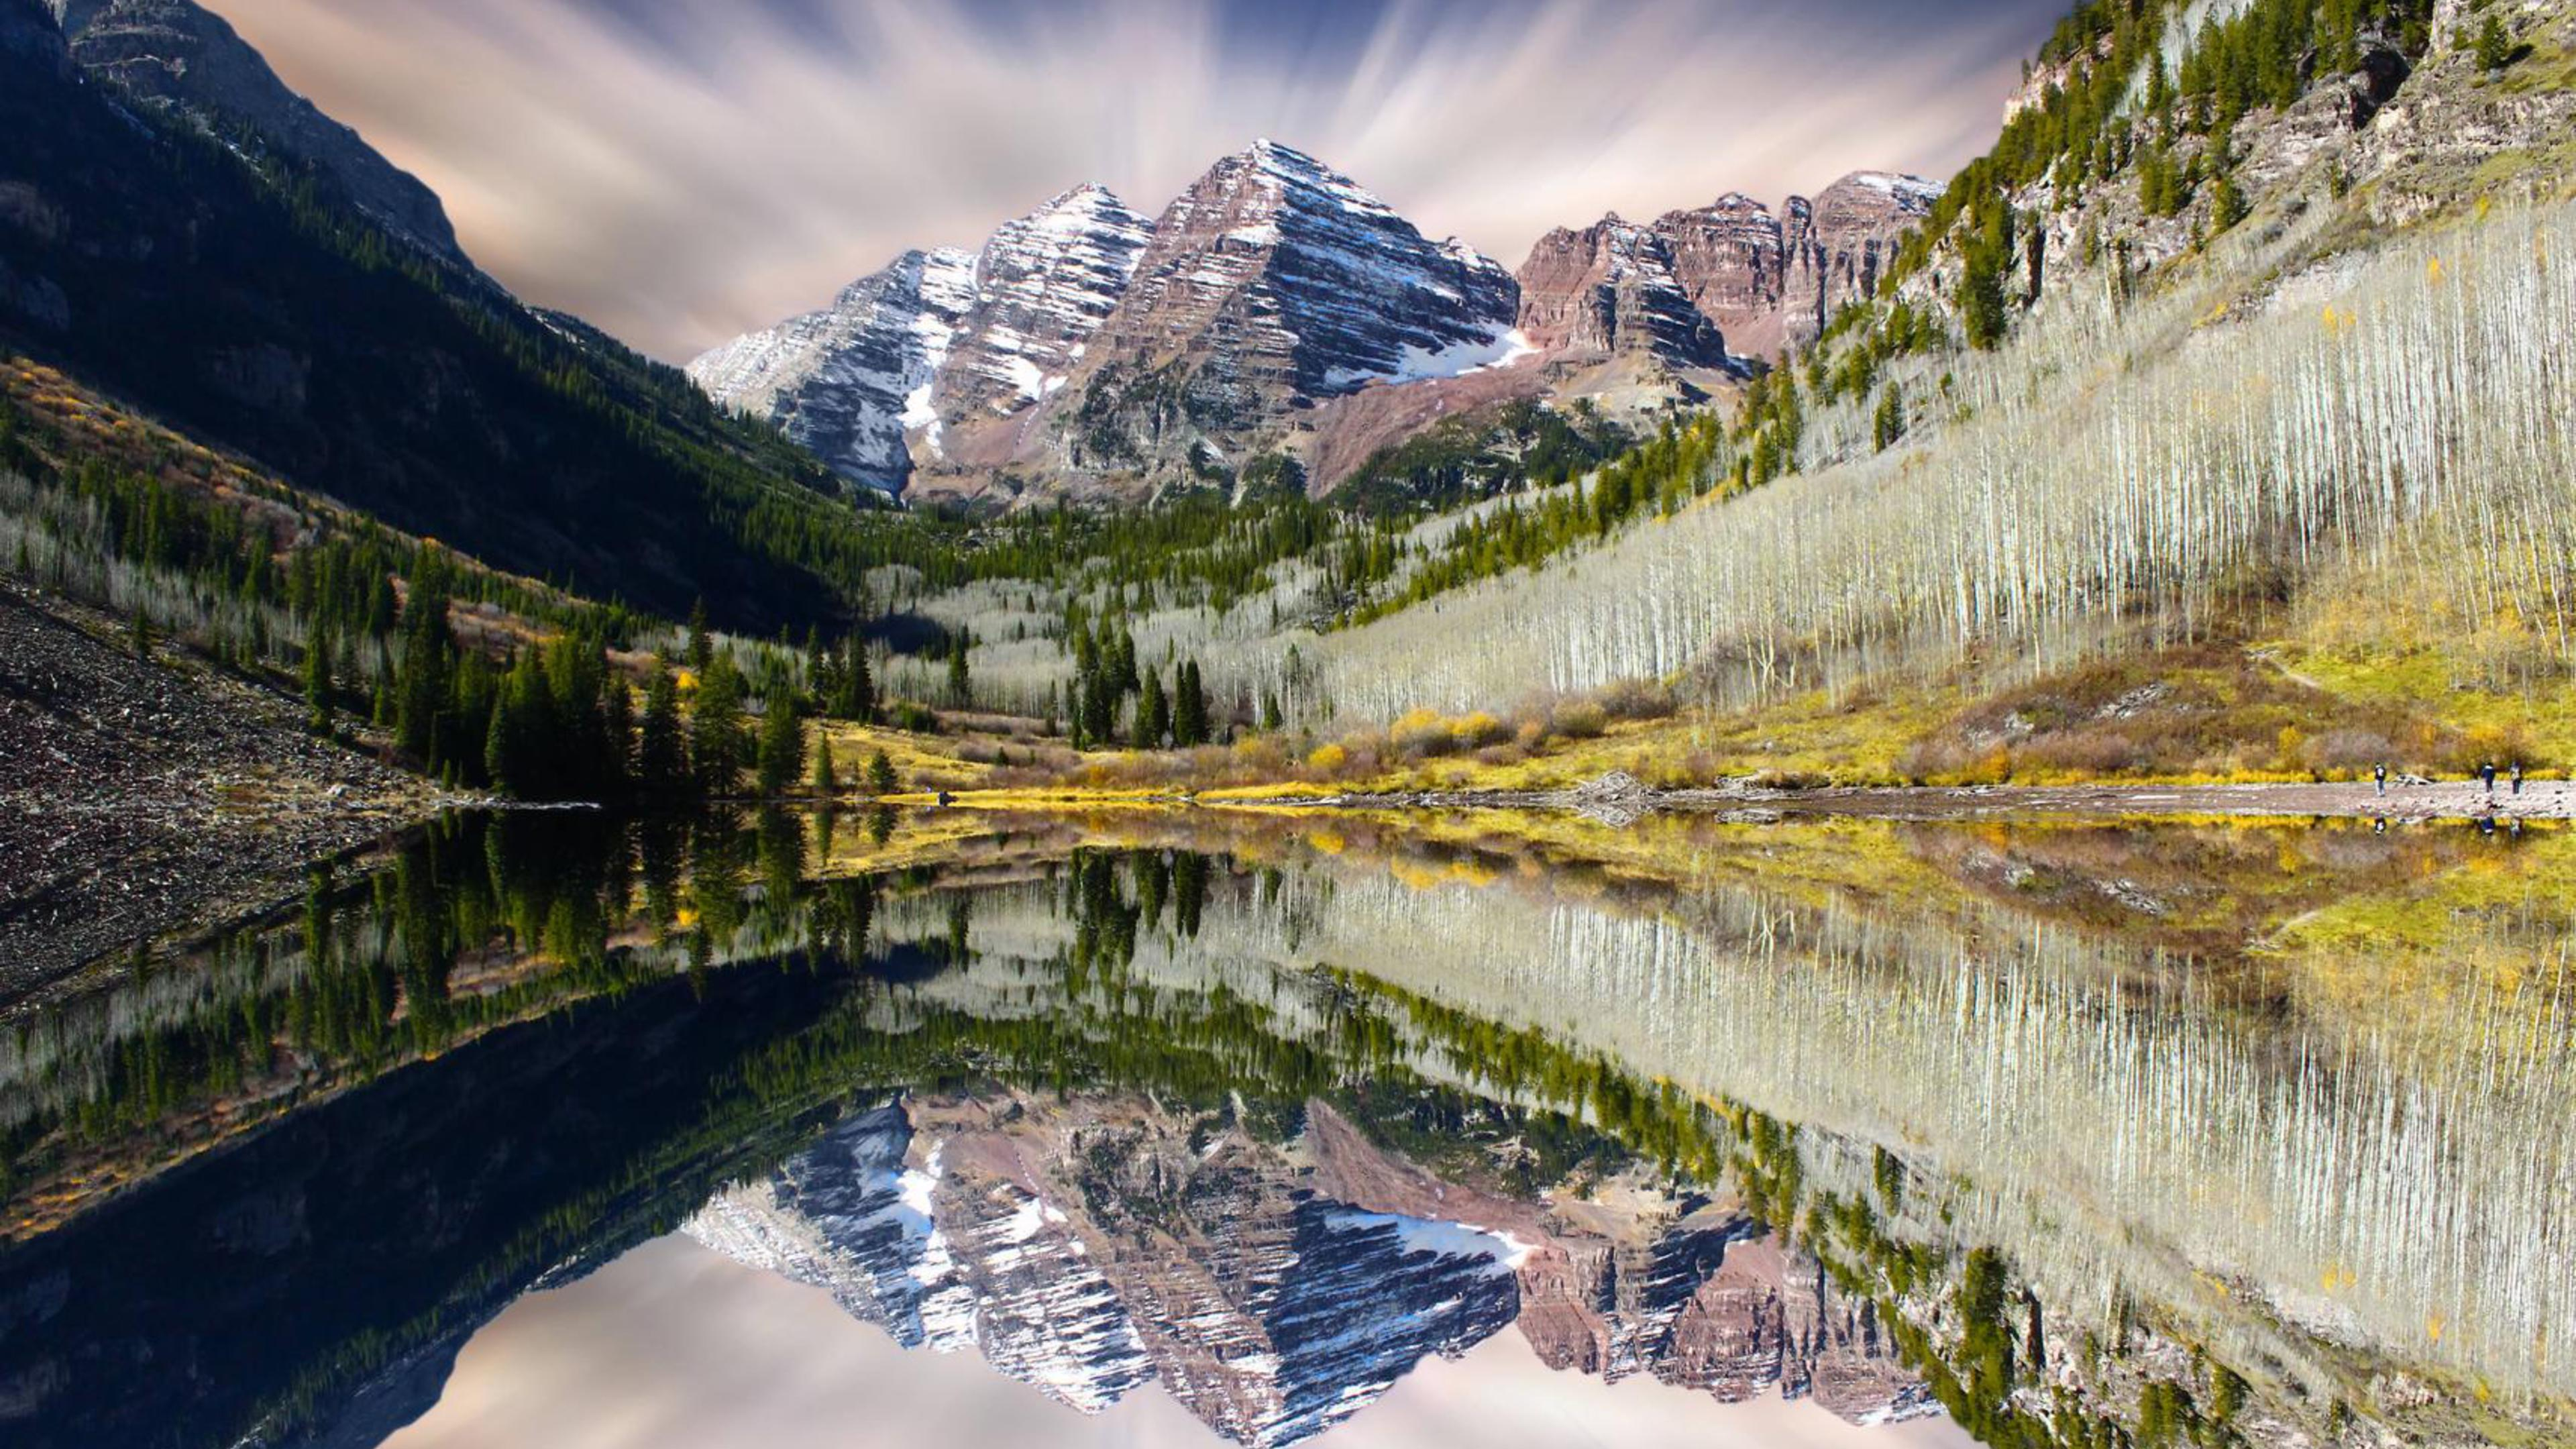 BOTPOST] Maroon Bells Aspen Colorado [3840x2160] iimgurcom 3840x2160